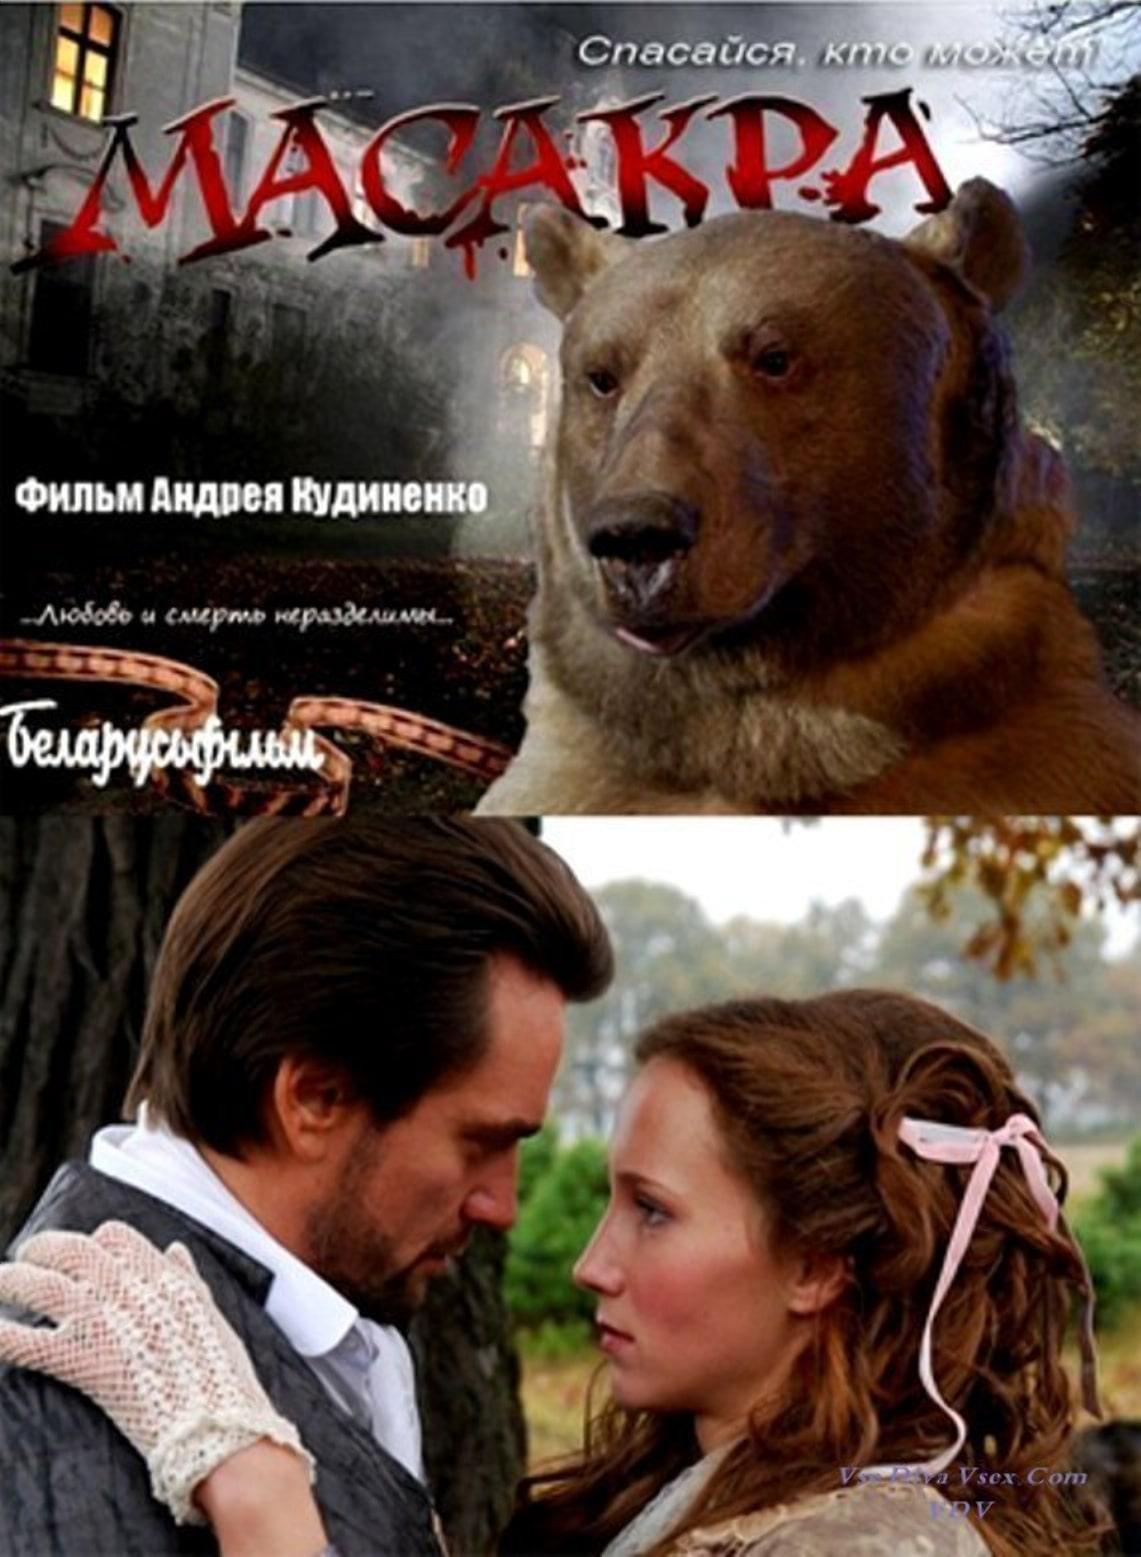 Масакра - белорусский хоррор